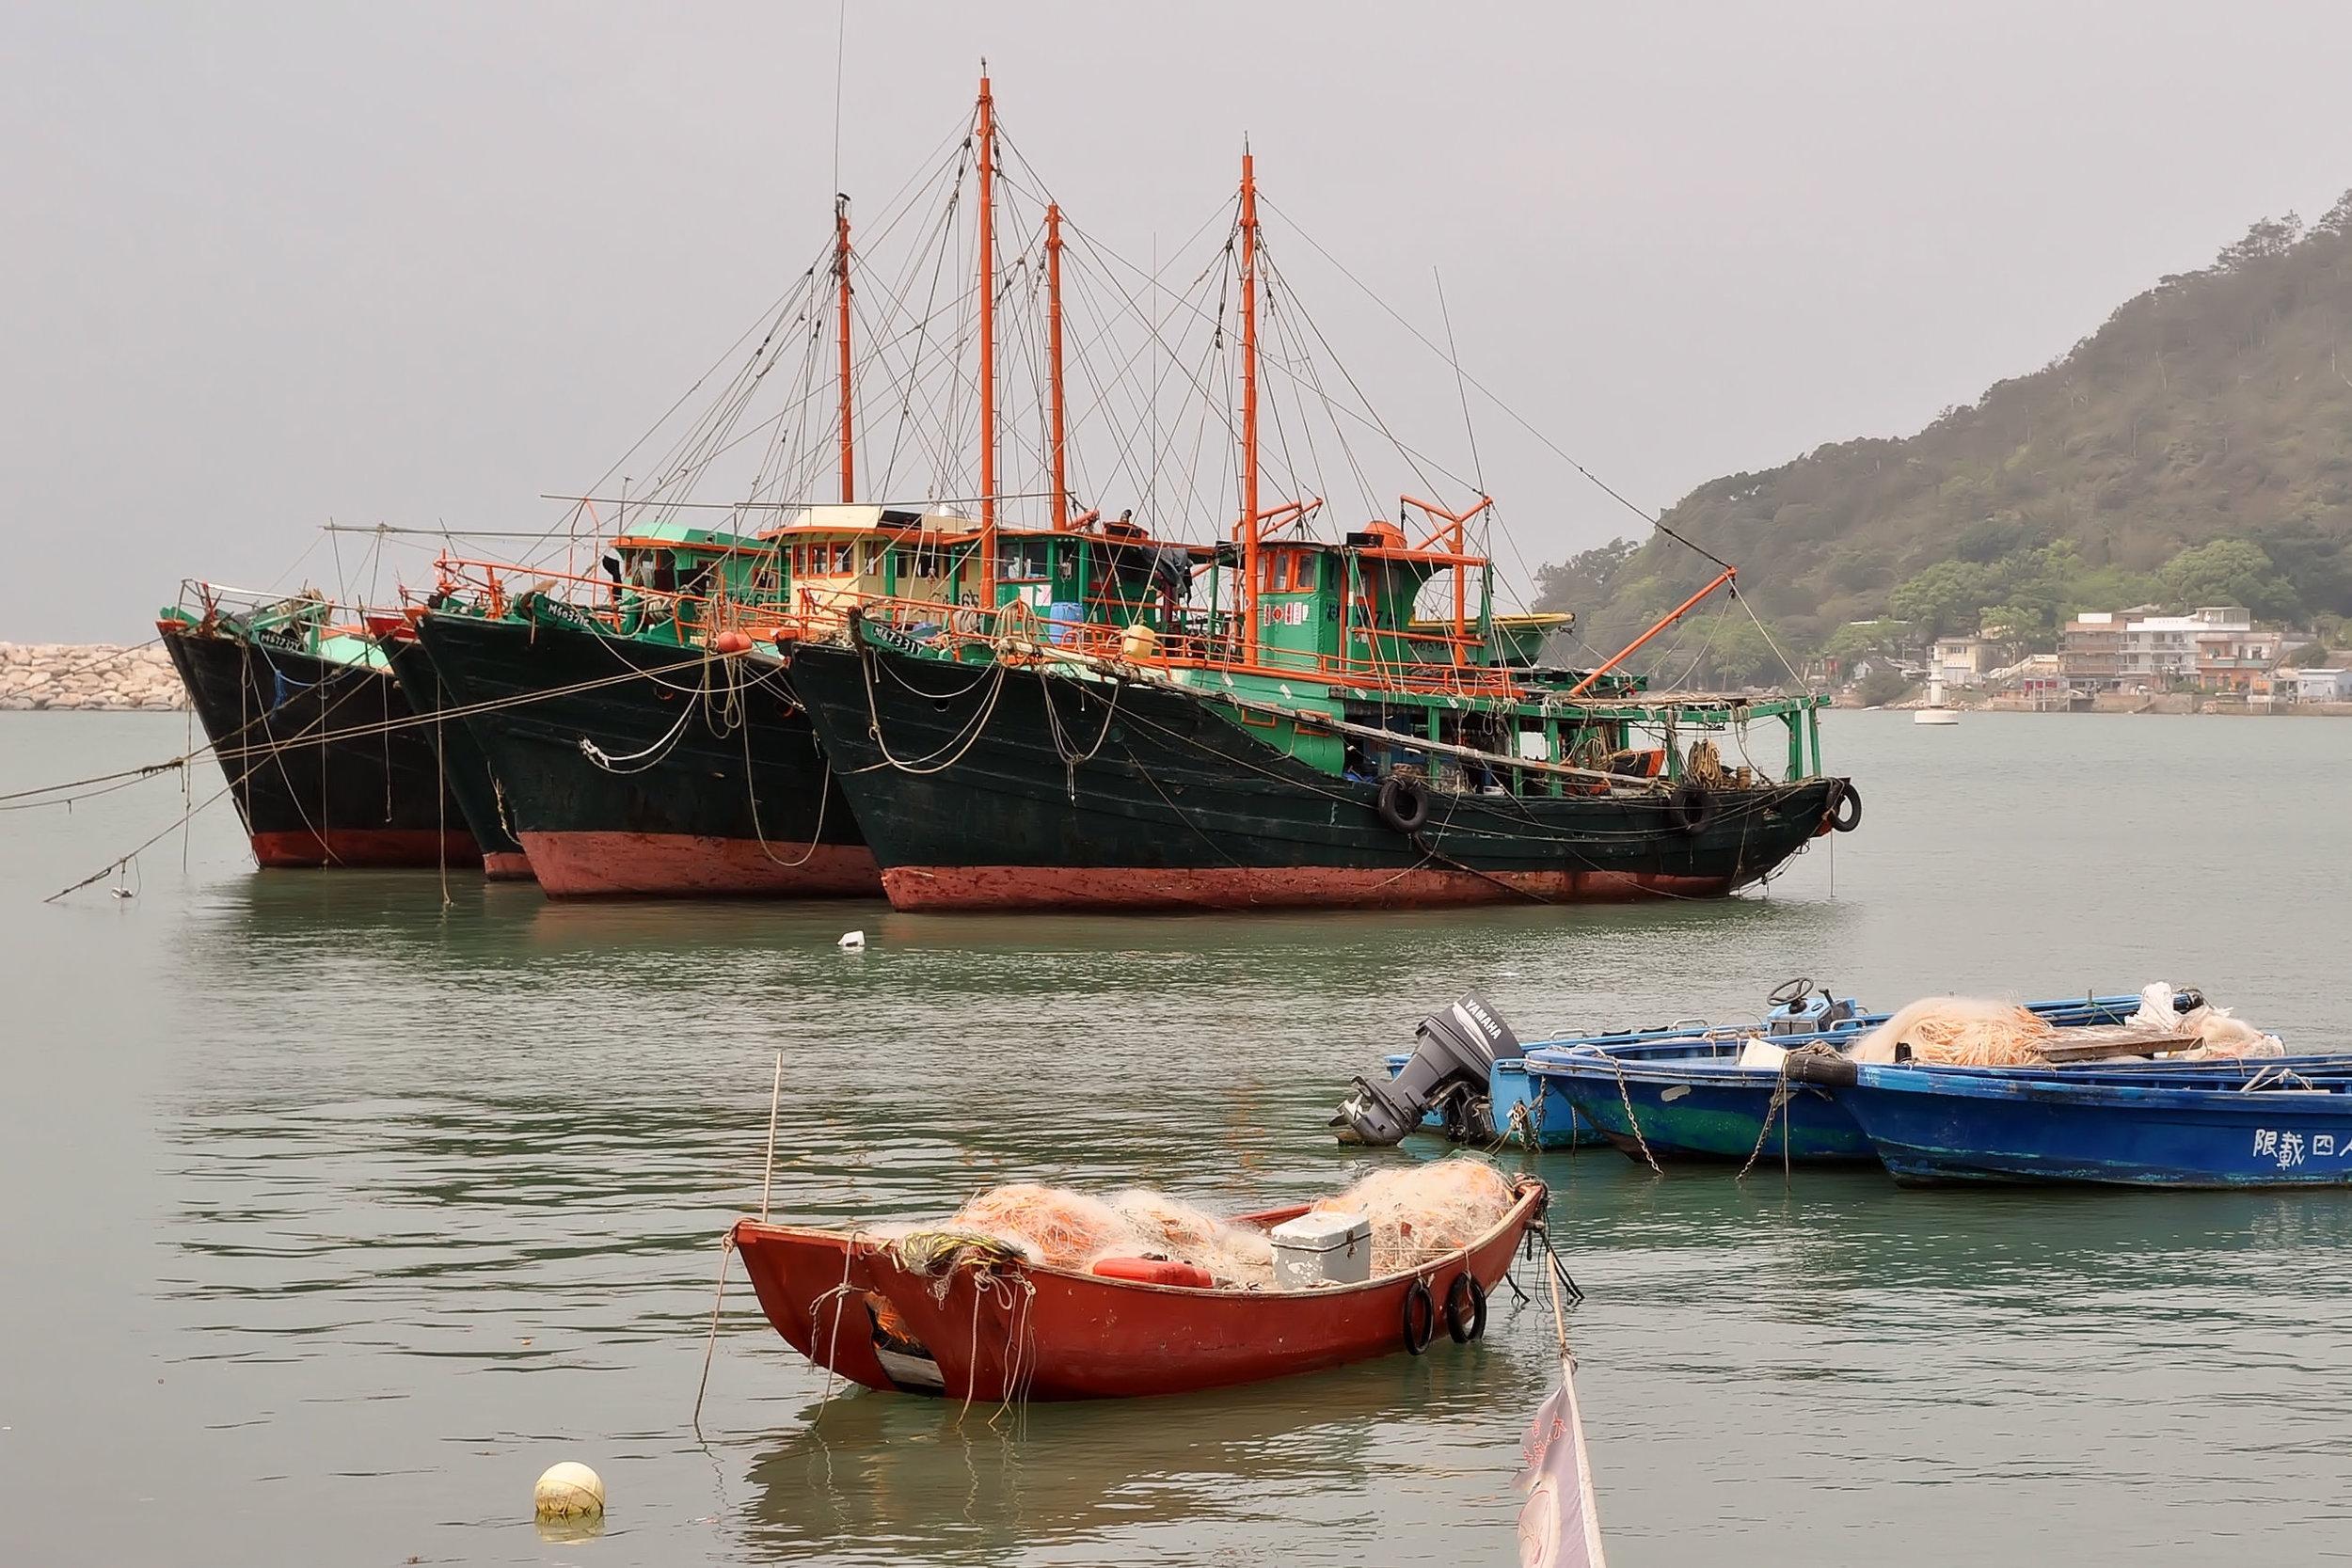 Fishing boats in the fishing village of Tai O on Lantau Island, Hong Kong.